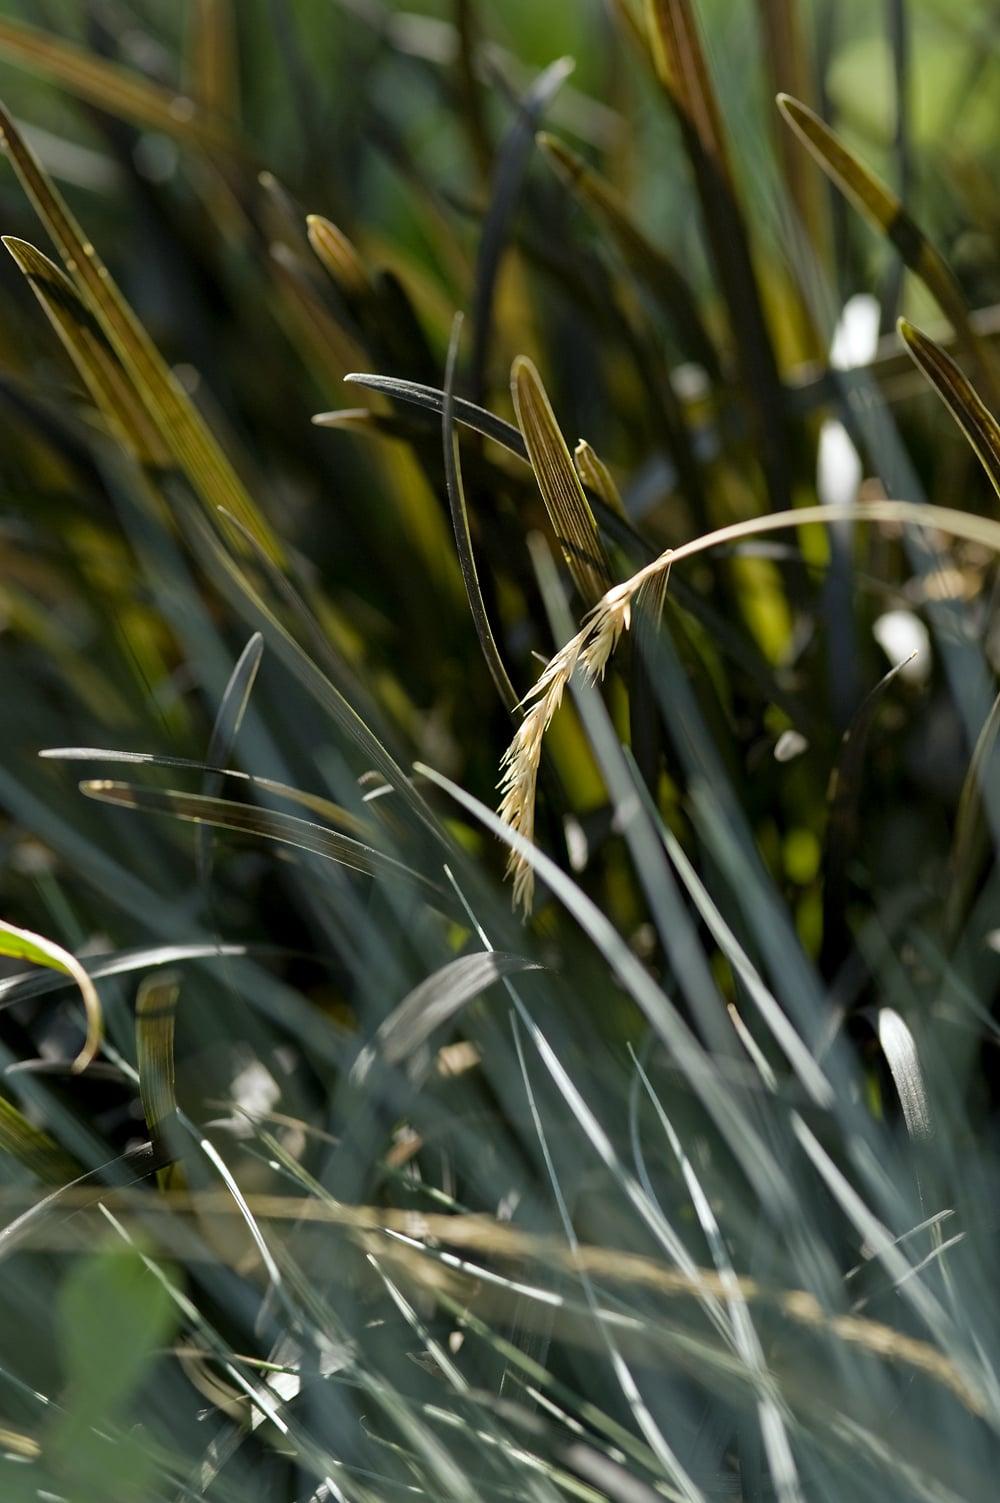 #12 Black & blue grass